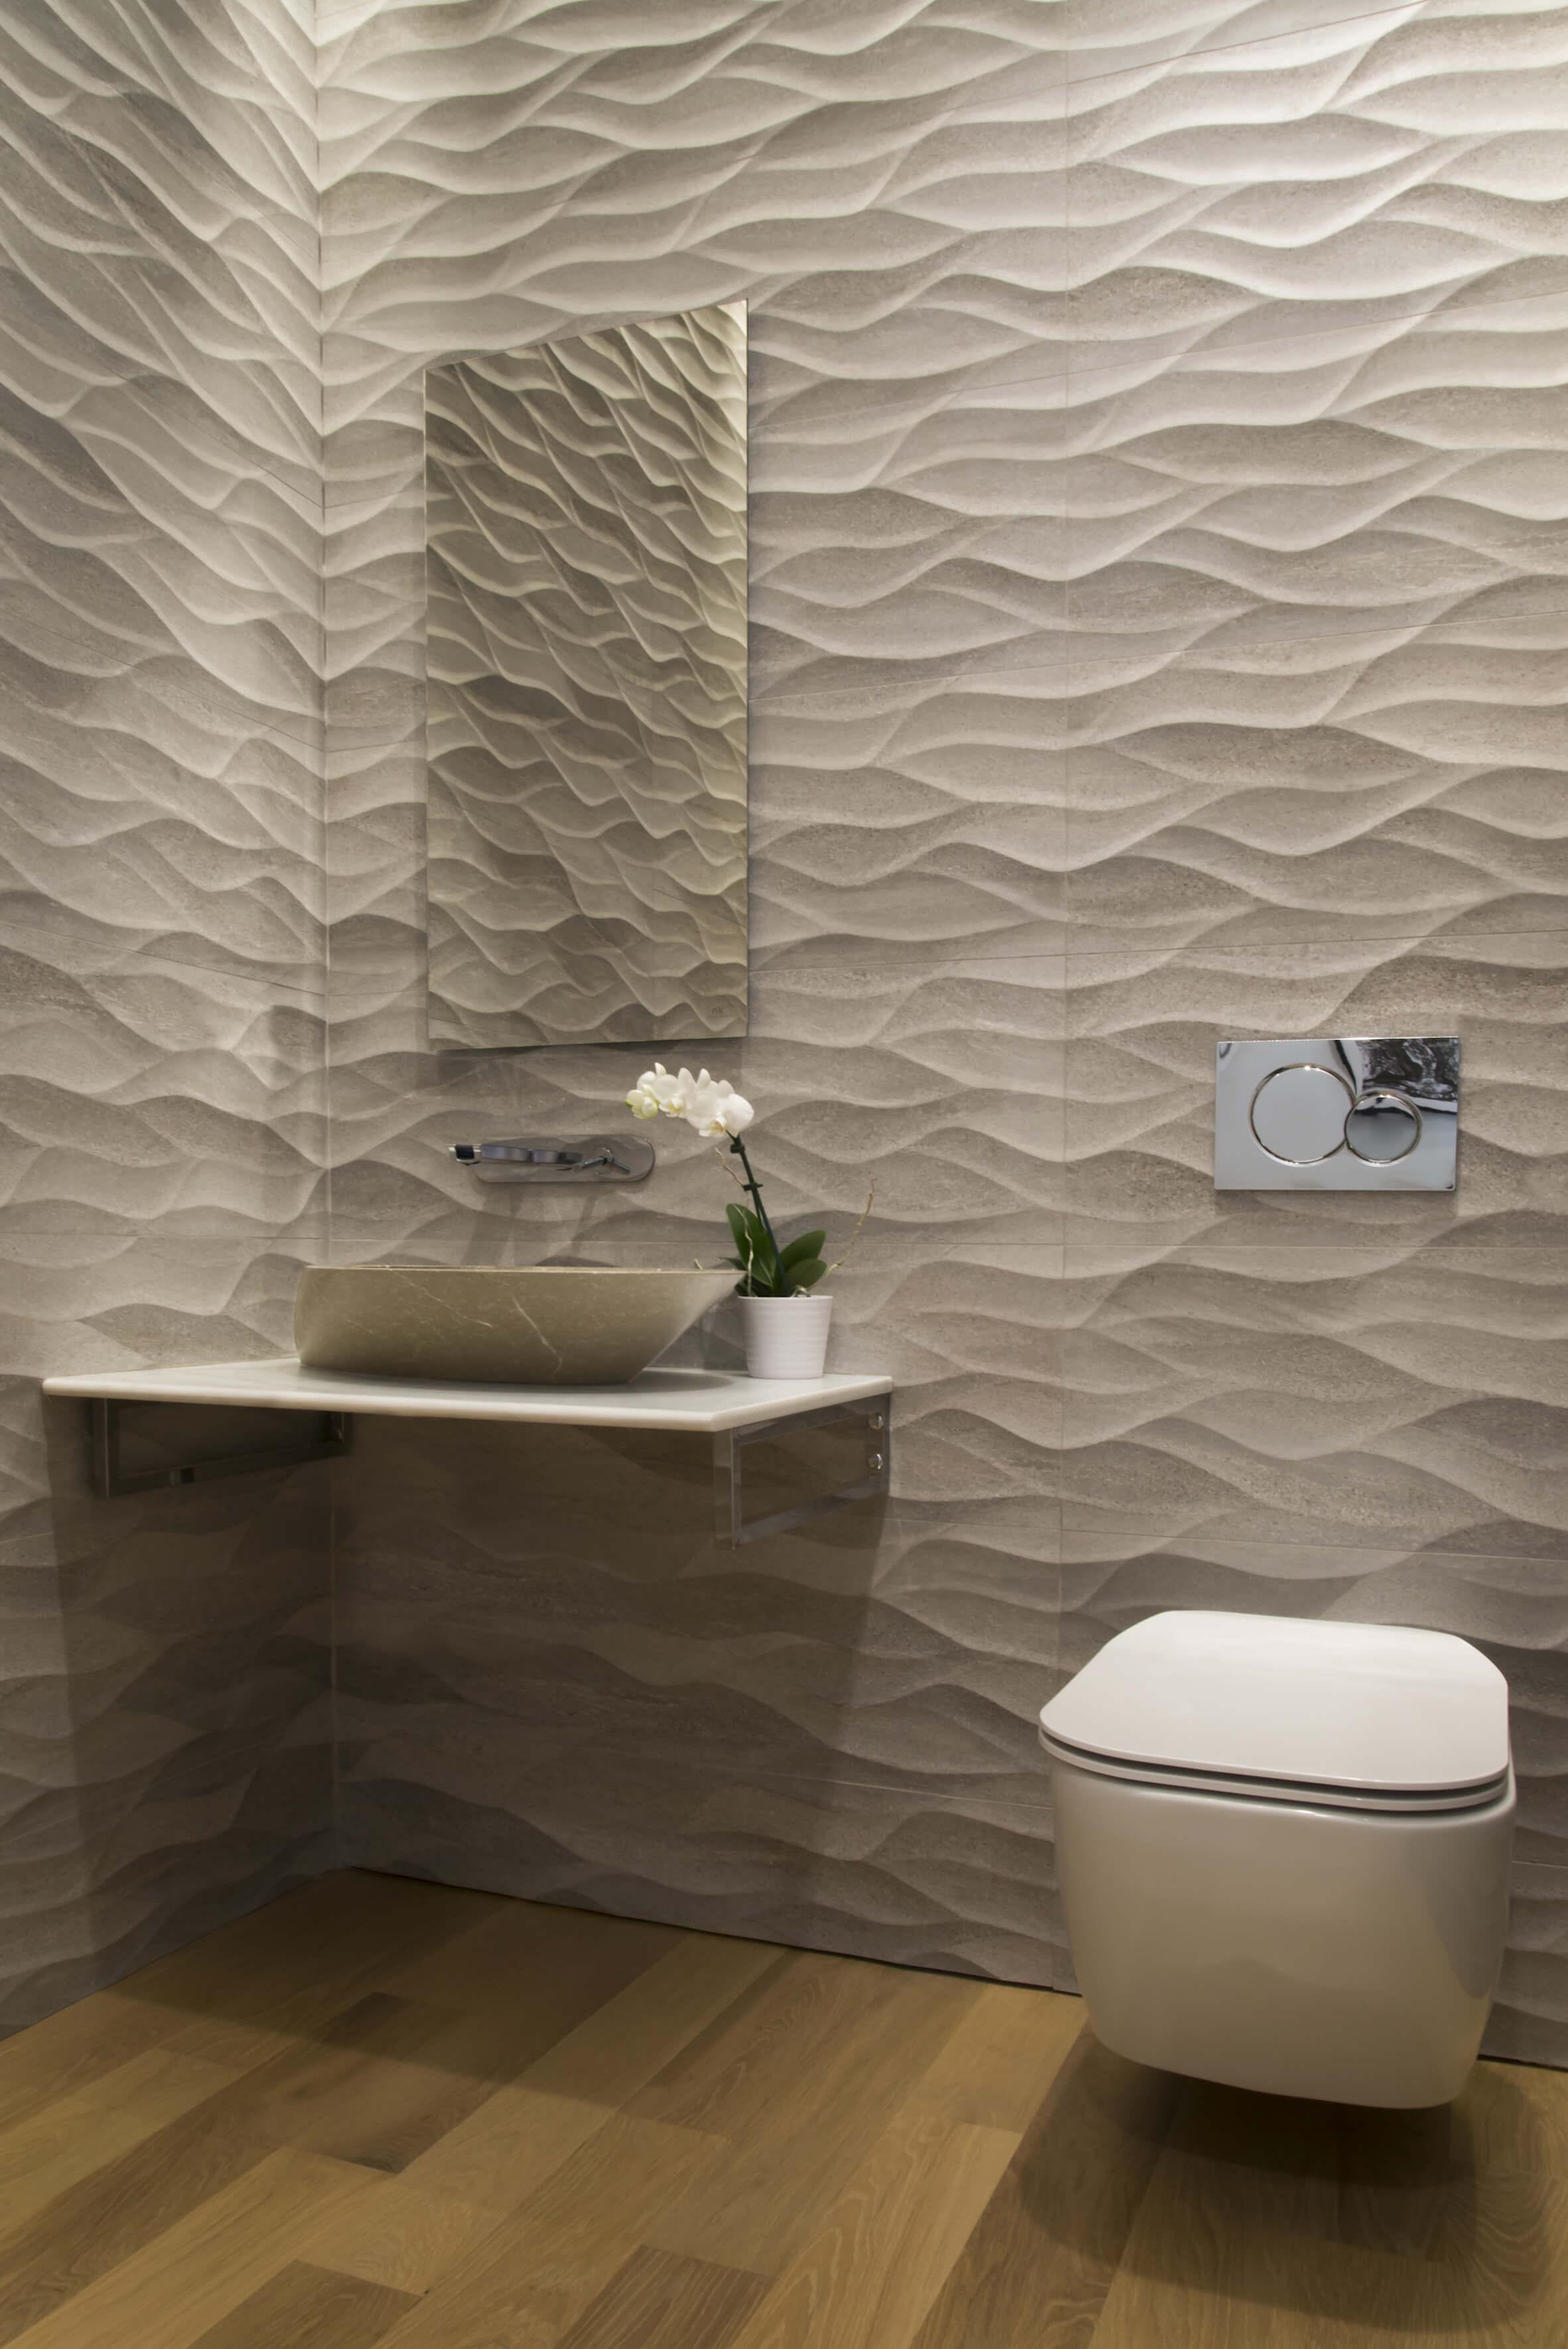 Custom contemporary bathroom with textured Porcelanosa tile designed by Interior Designer RM Interiors.